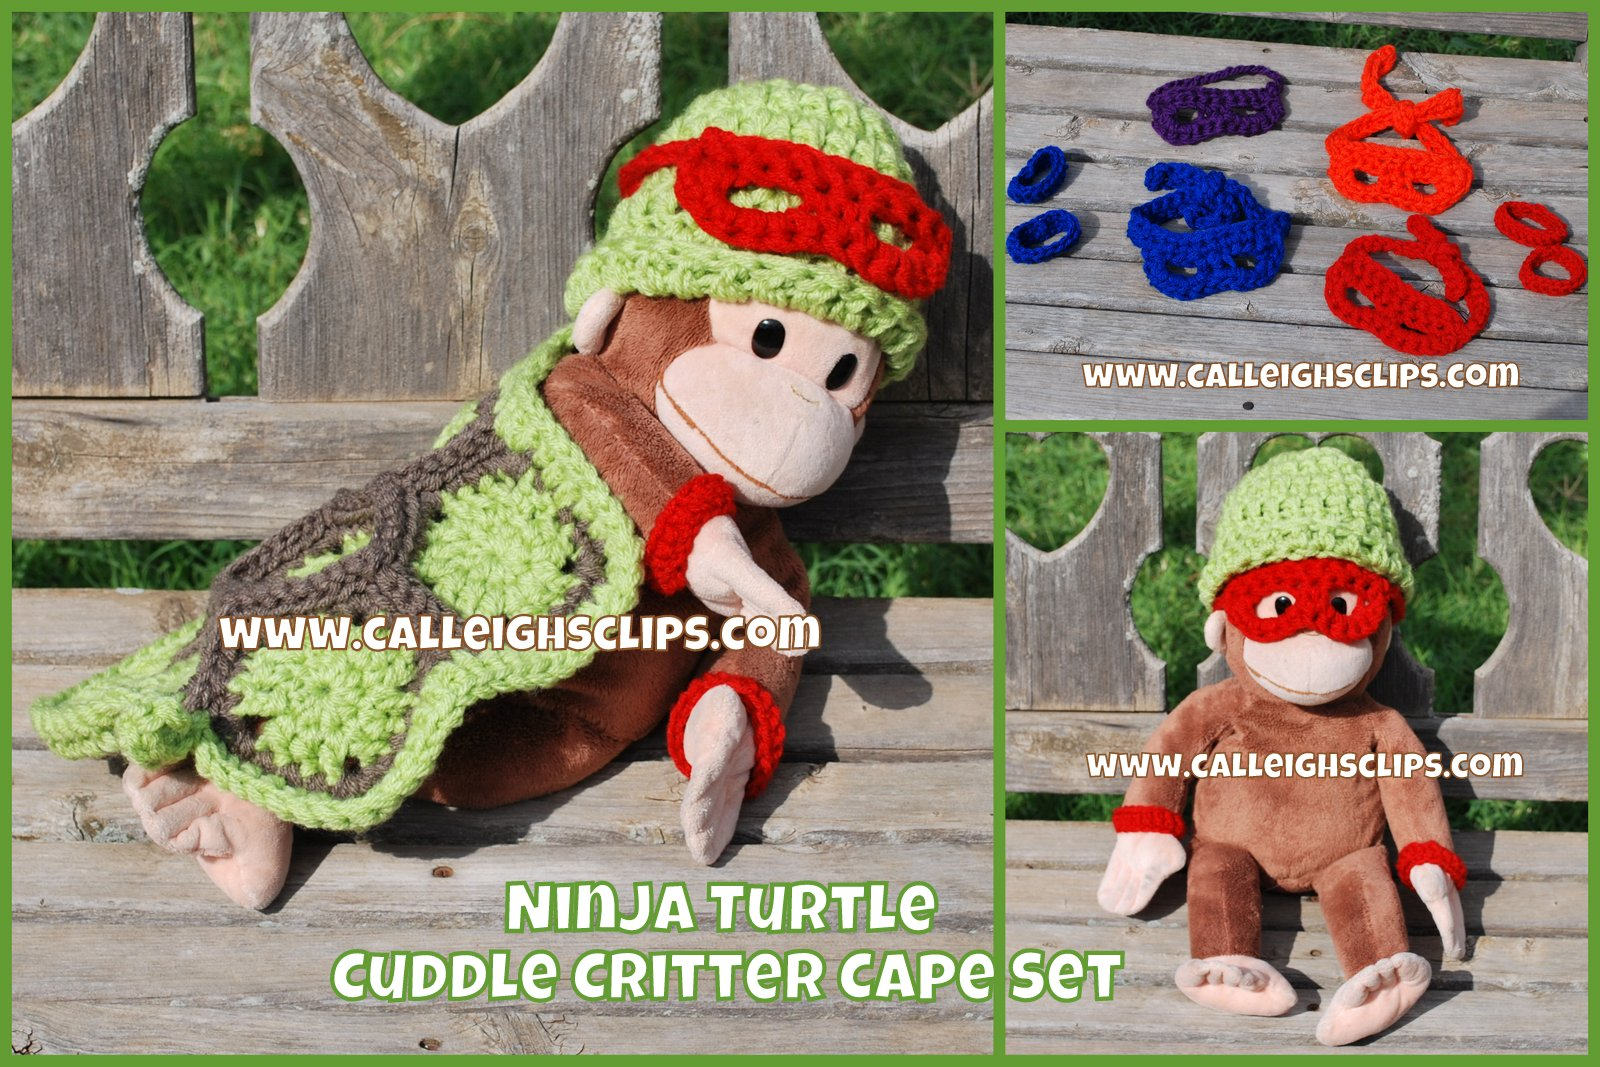 Free Crochet Pattern Ninja Turtle Mask : Calleighs Clips & Crochet Creations: Free Pattern ...